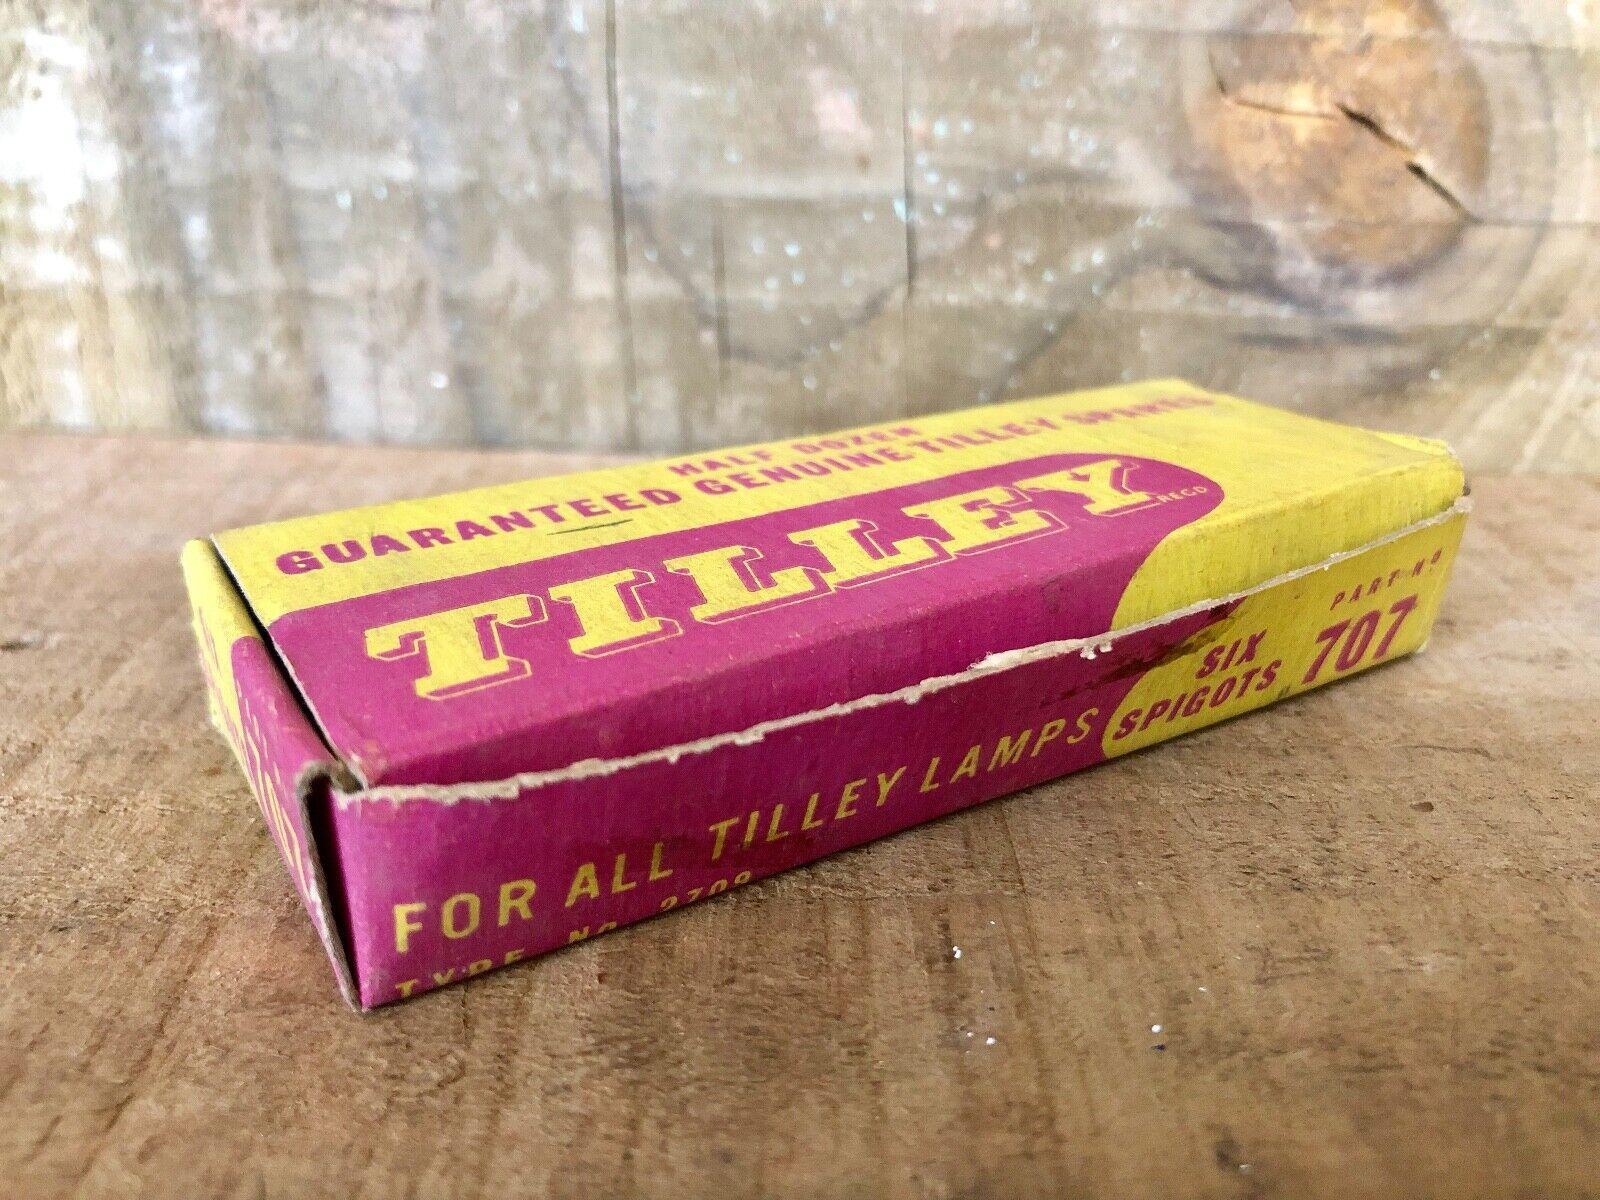 VINTAGE NOS FULL BOX 6 GENUINE TILLEY 707 MANTLE  SUPPORT SPIGOT COLLECTABLE  deals sale